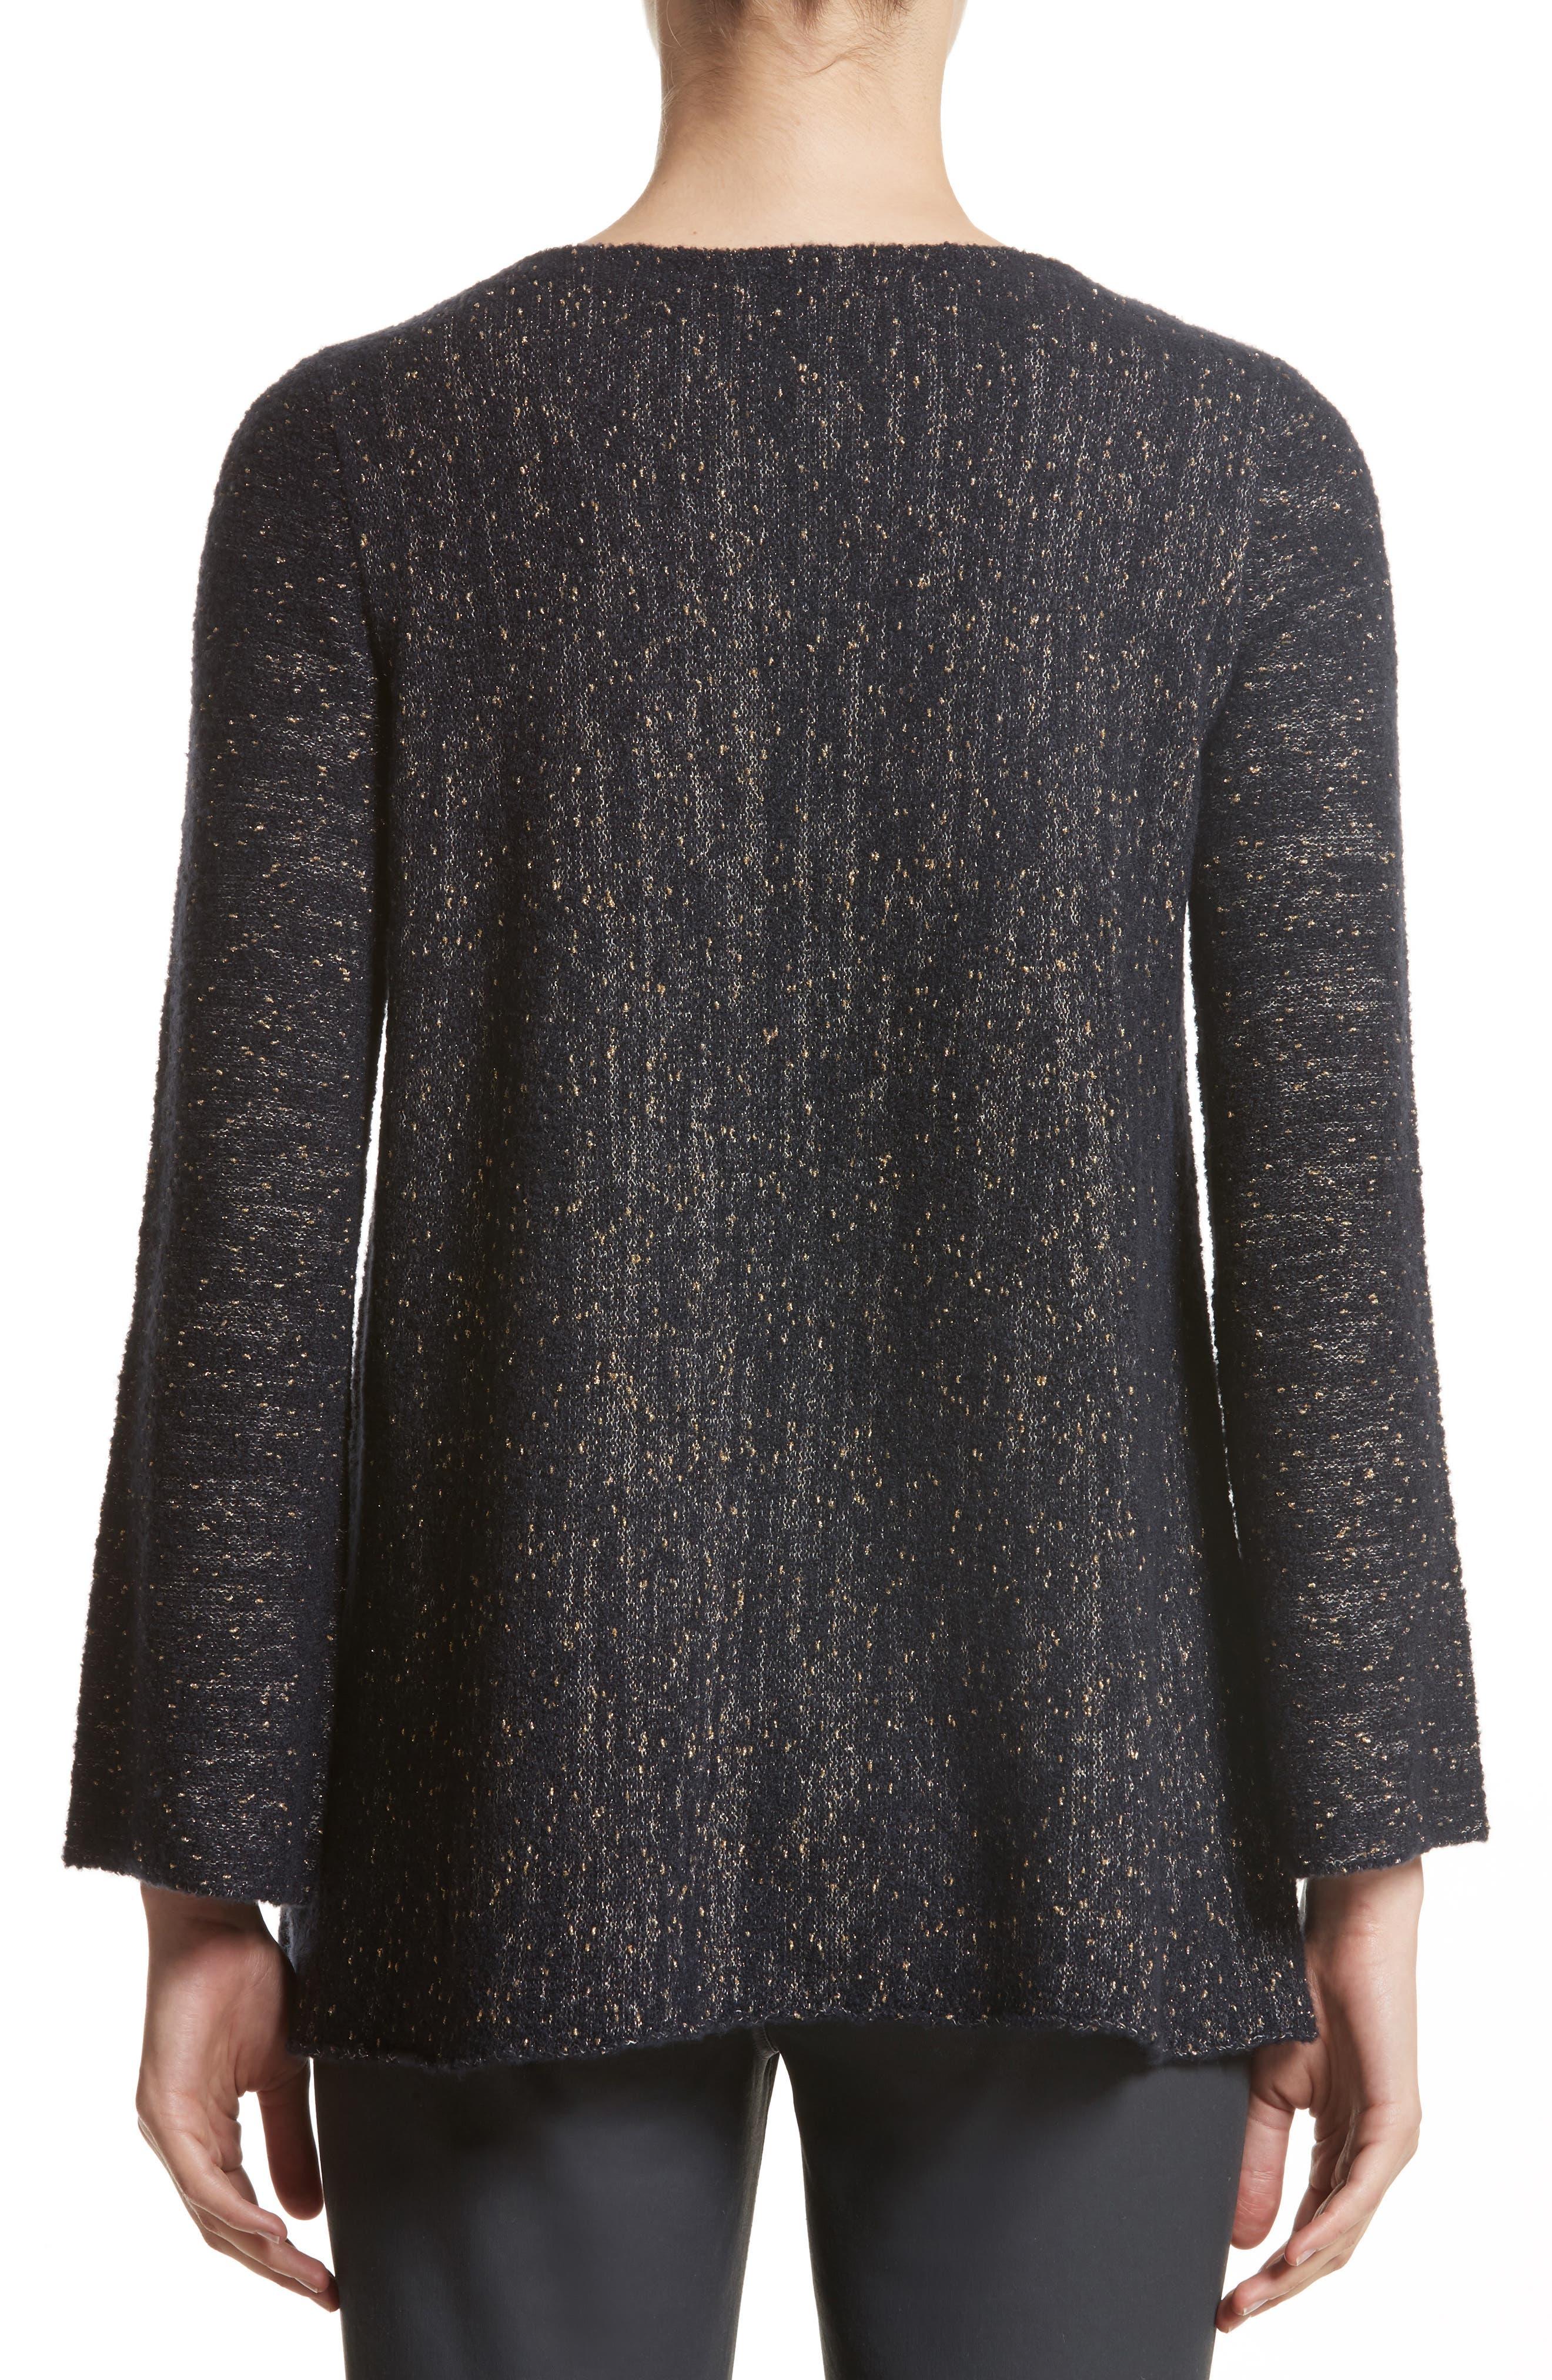 Lafayette Metallic Knit A-Line Sweater,                             Alternate thumbnail 2, color,                             Ink Metallic